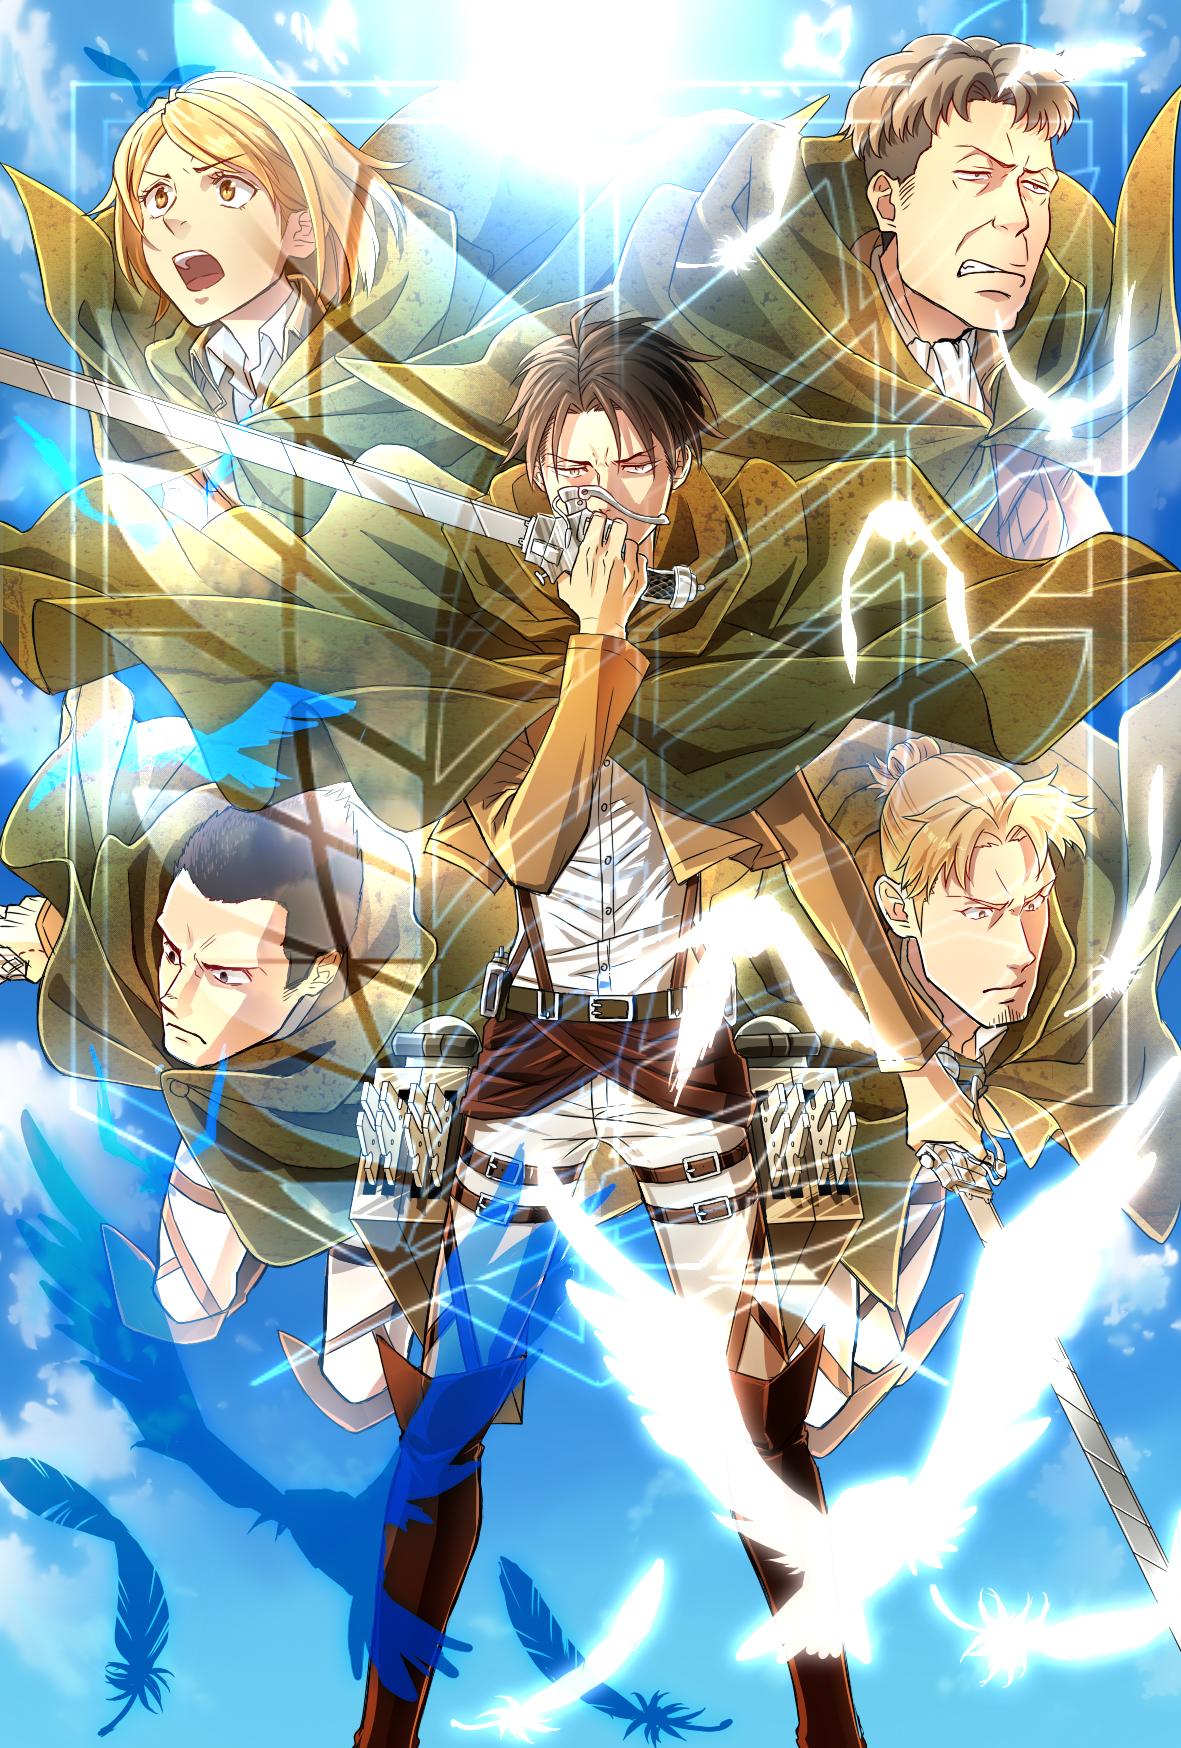 Special Operations Squad Attack On Titan Mobile Wallpaper 1573057 Zerochan Anime Image Board